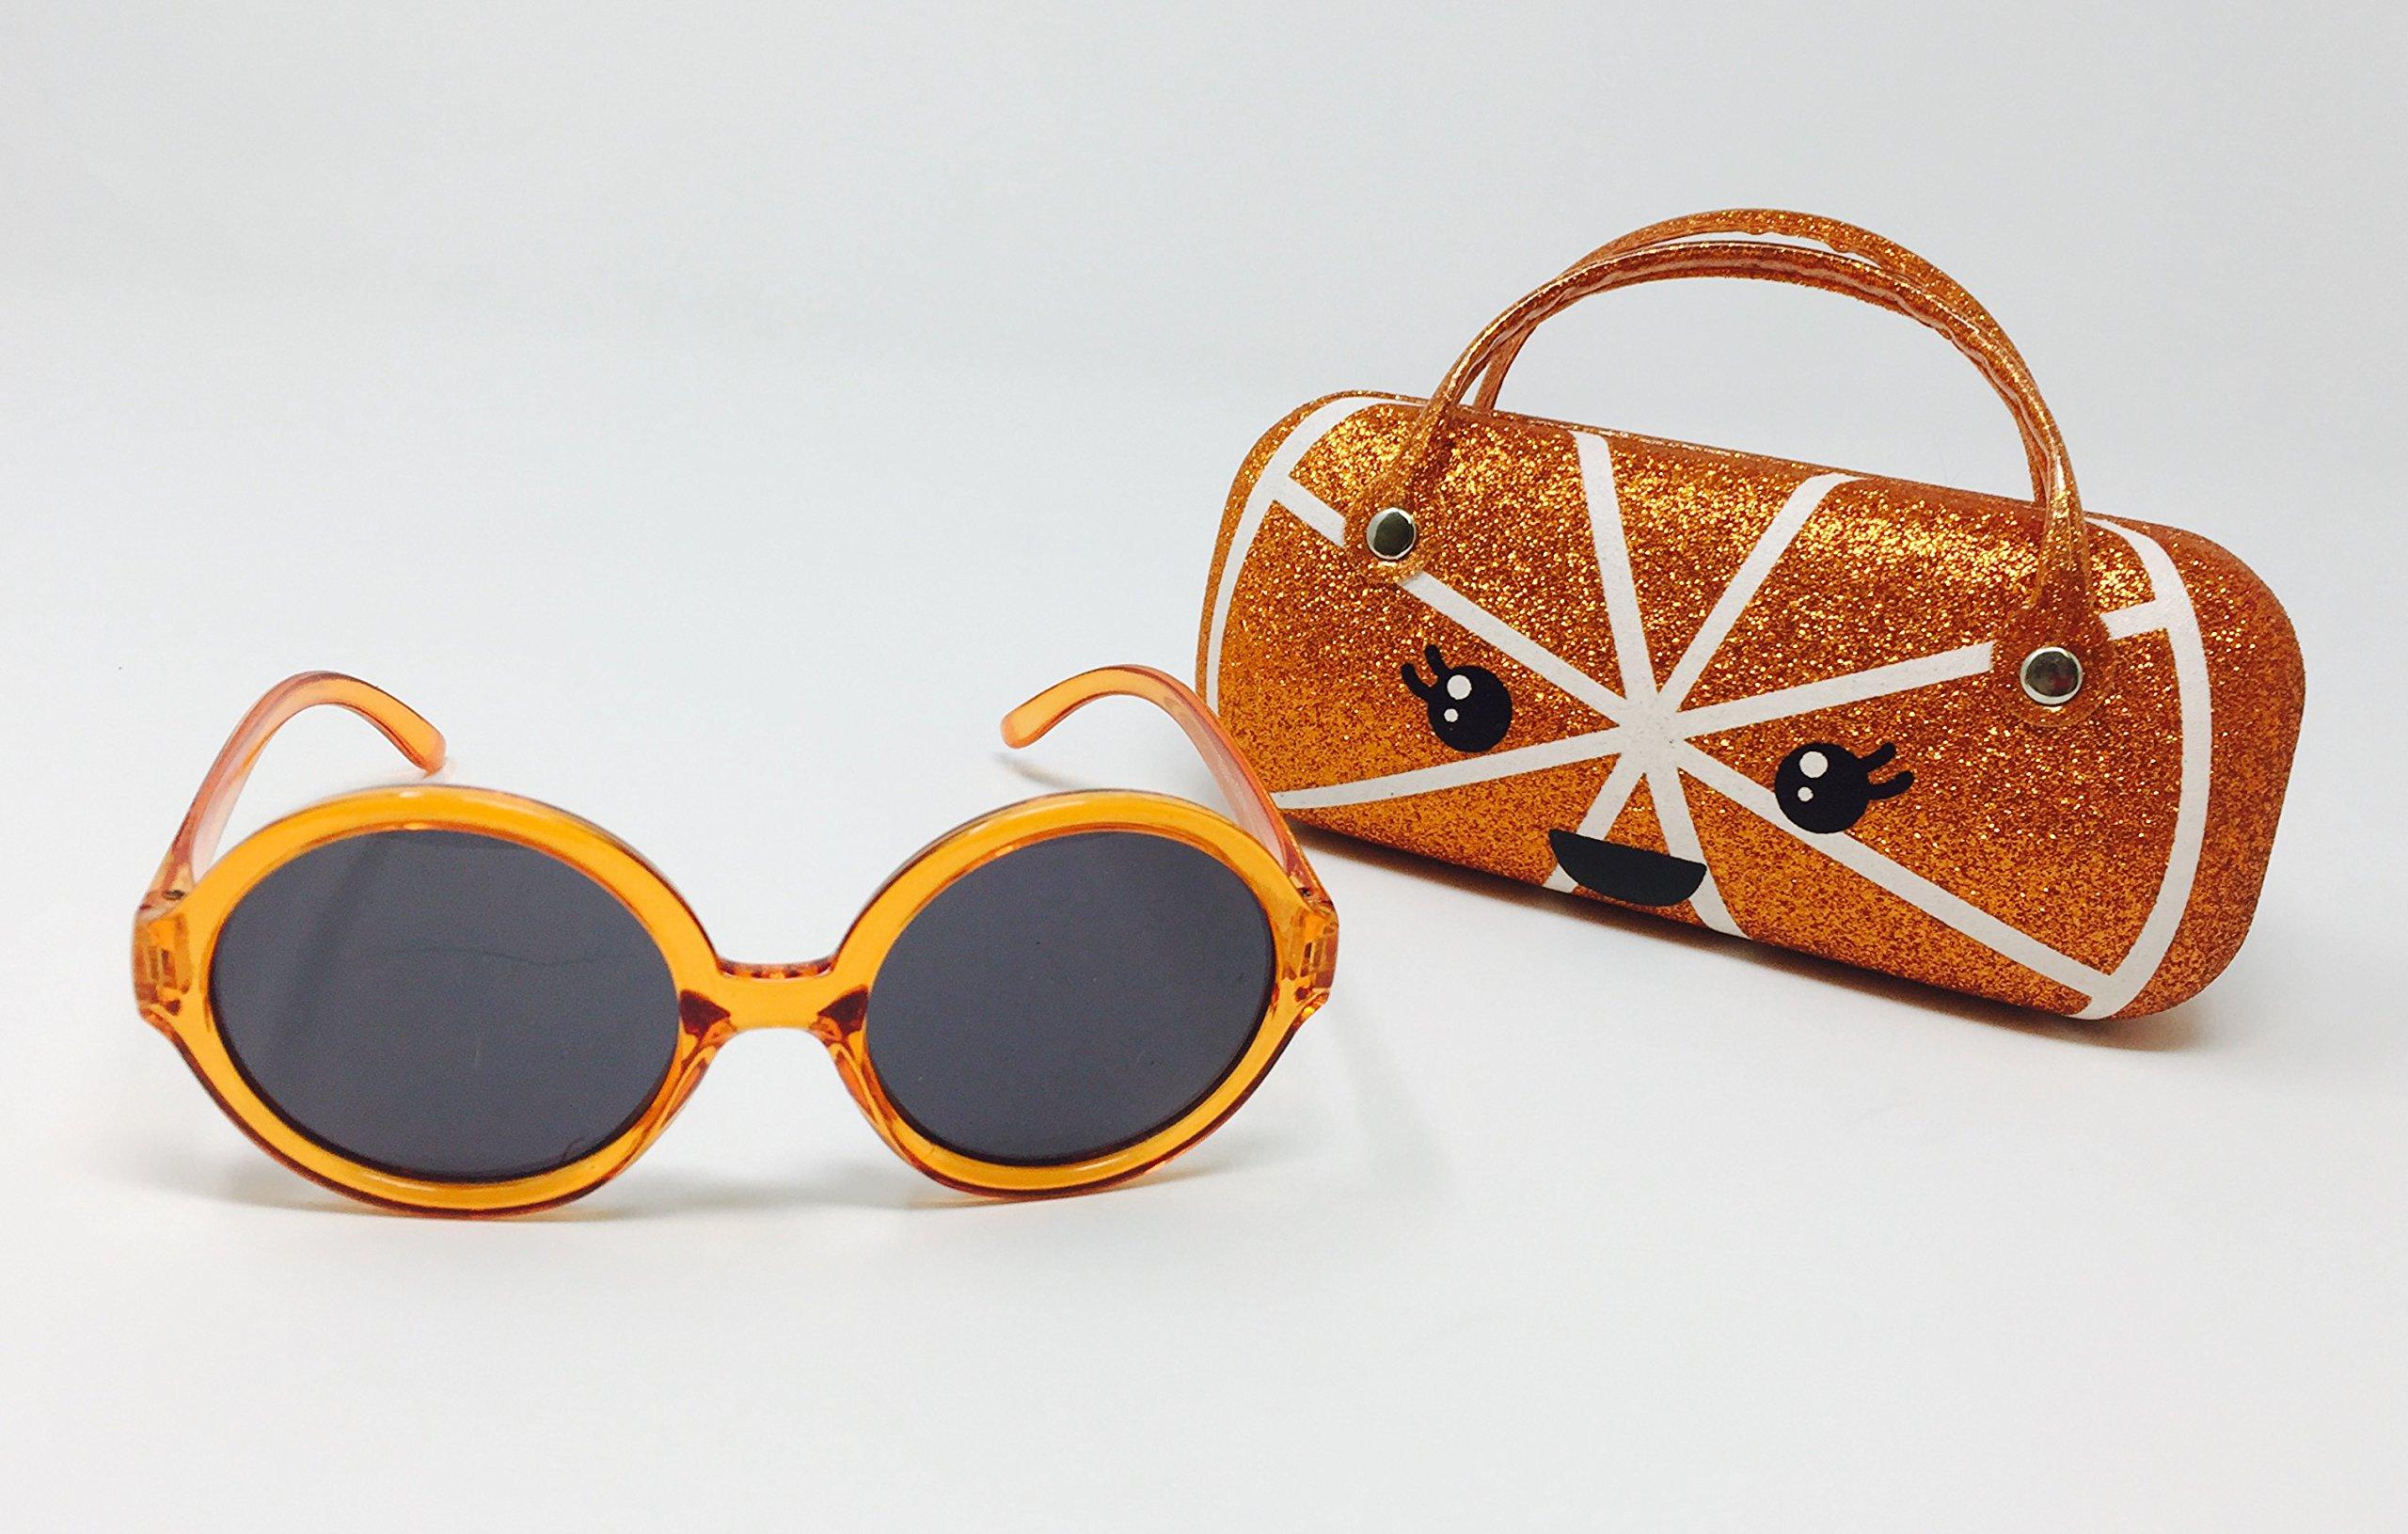 Orange Slice Summer Sunglasses with Adorable Orange Kawaii Case Set (Girls Size)